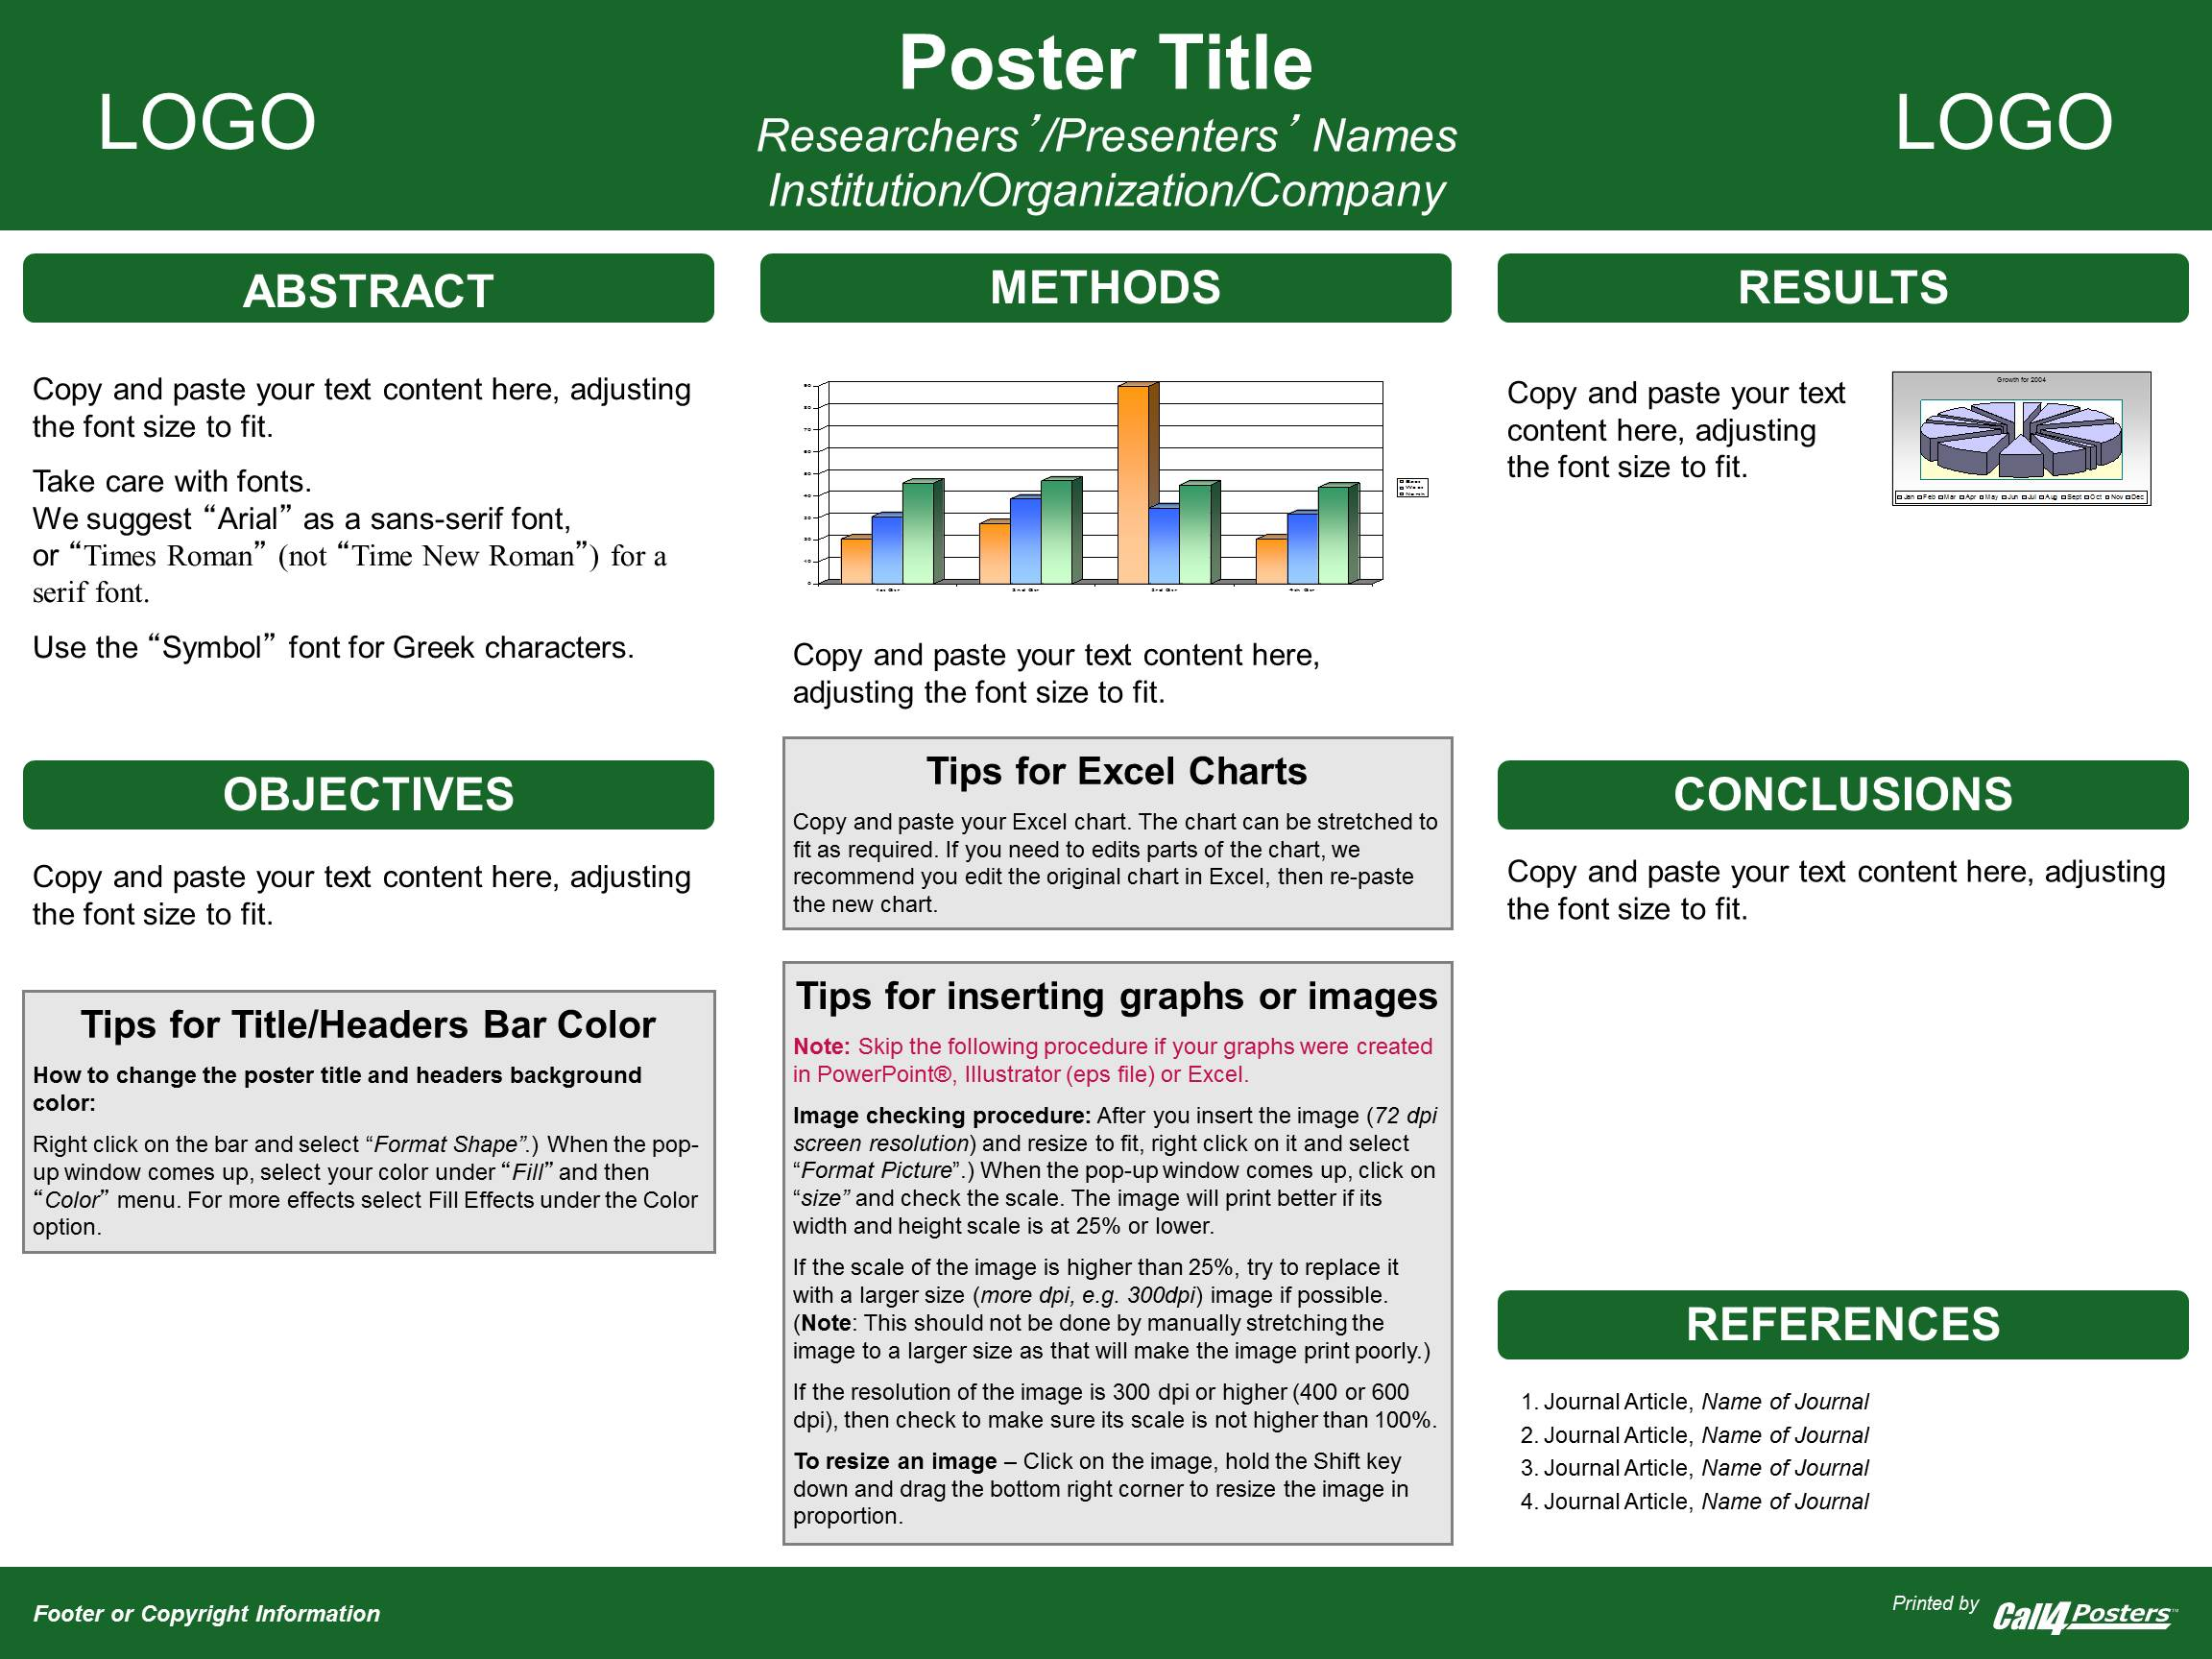 Poster Templates - LDI Domestic